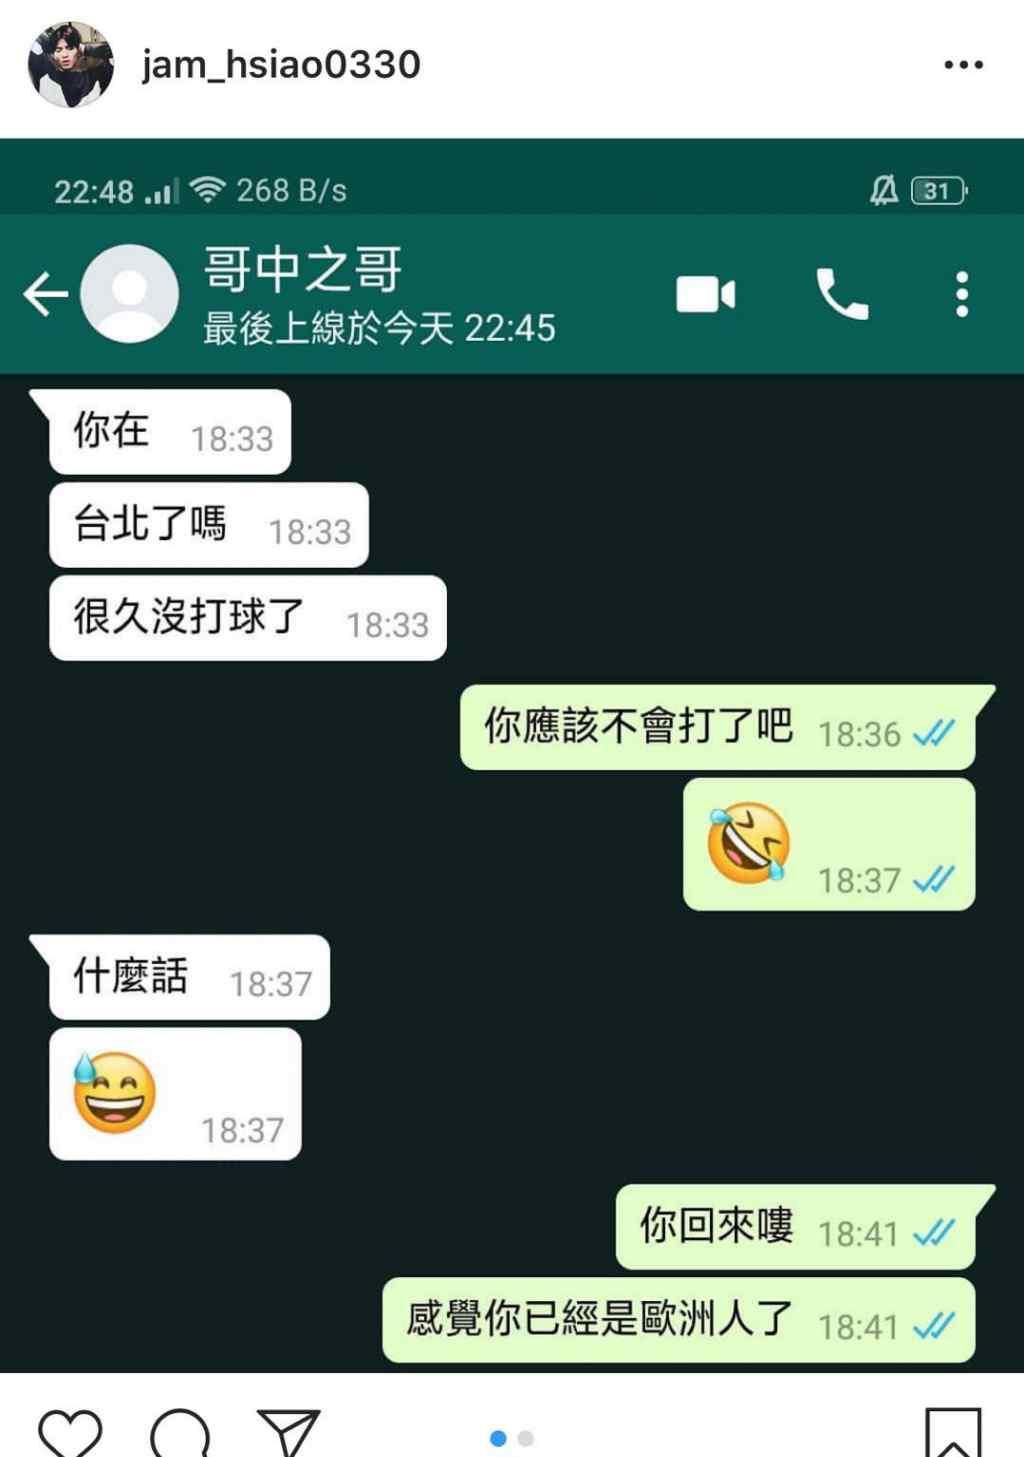 zhi哥 萧敬腾给周杰伦的备注是什么?网友看完后爆笑!哥中之哥是什么意思